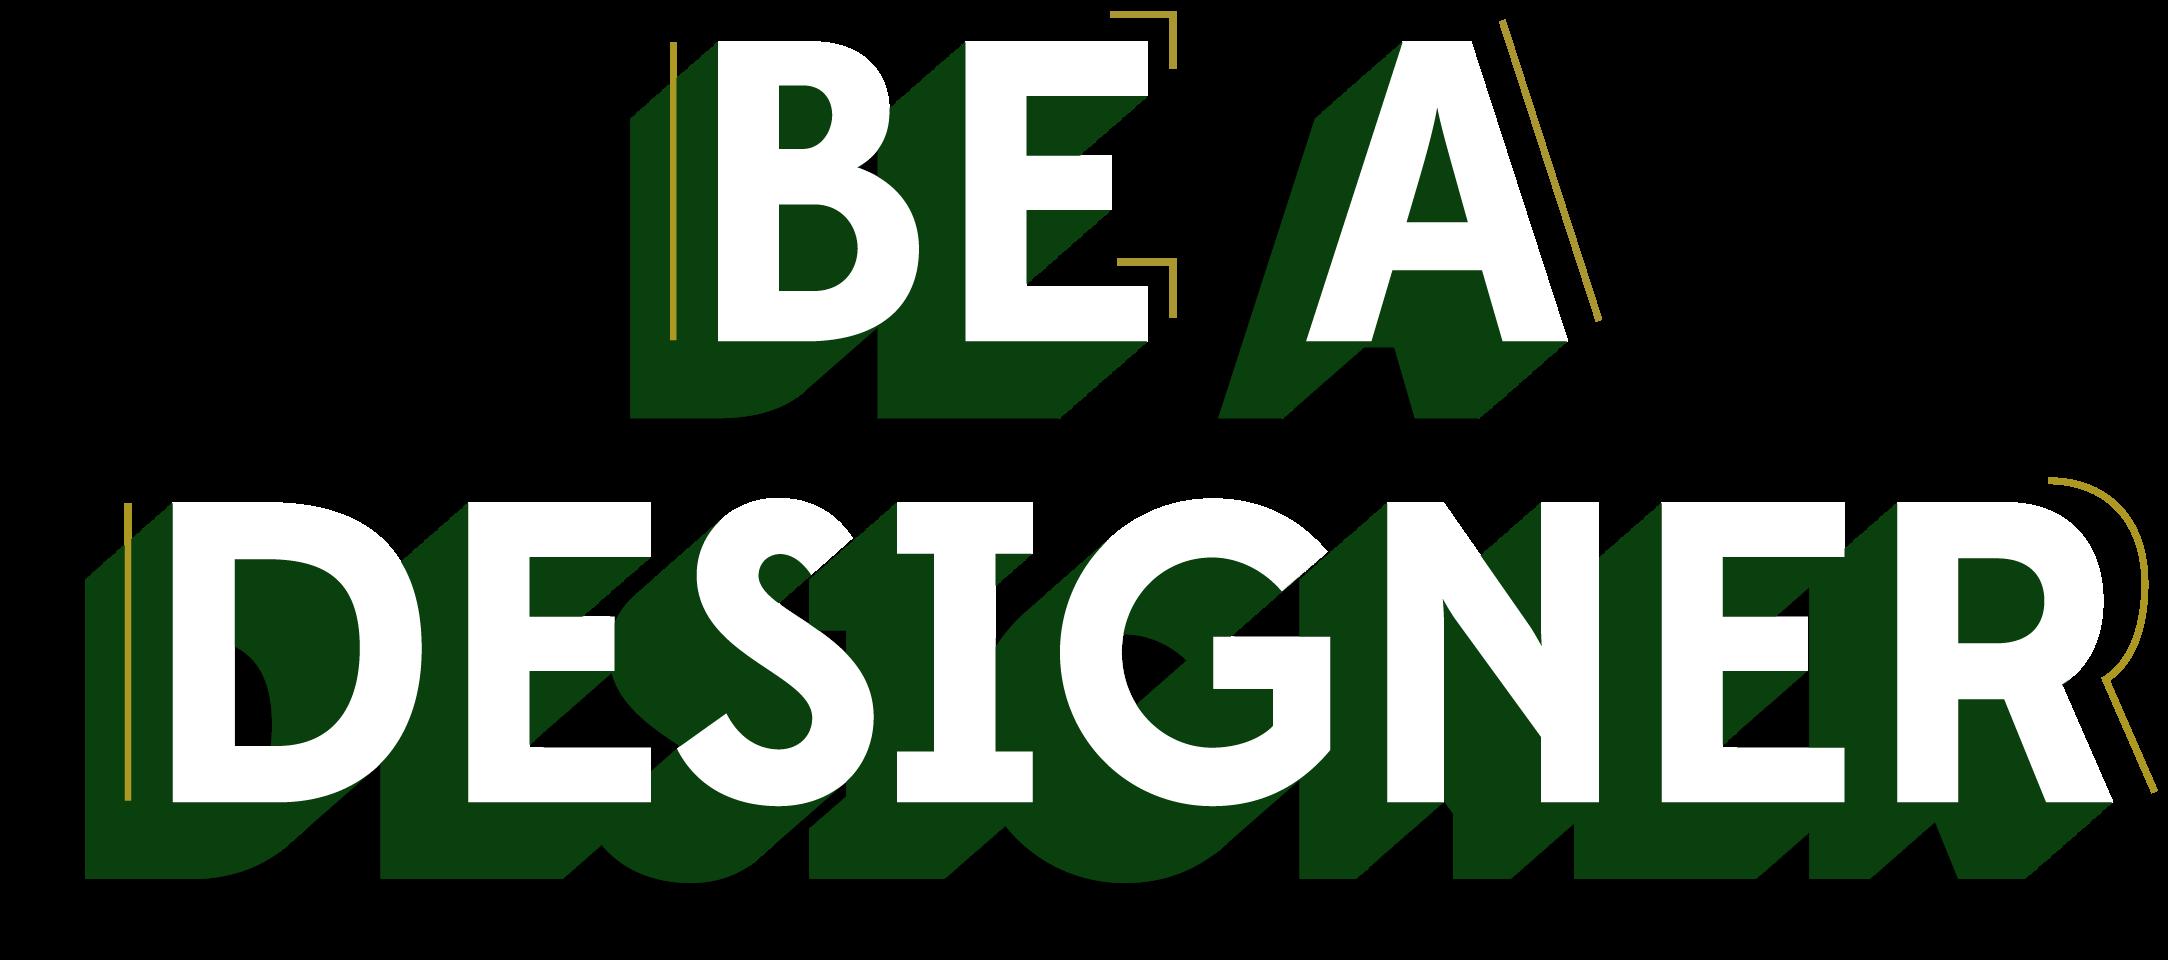 SLI_Website_Headlines_1_rh_Be A Designer - Green_FINAL